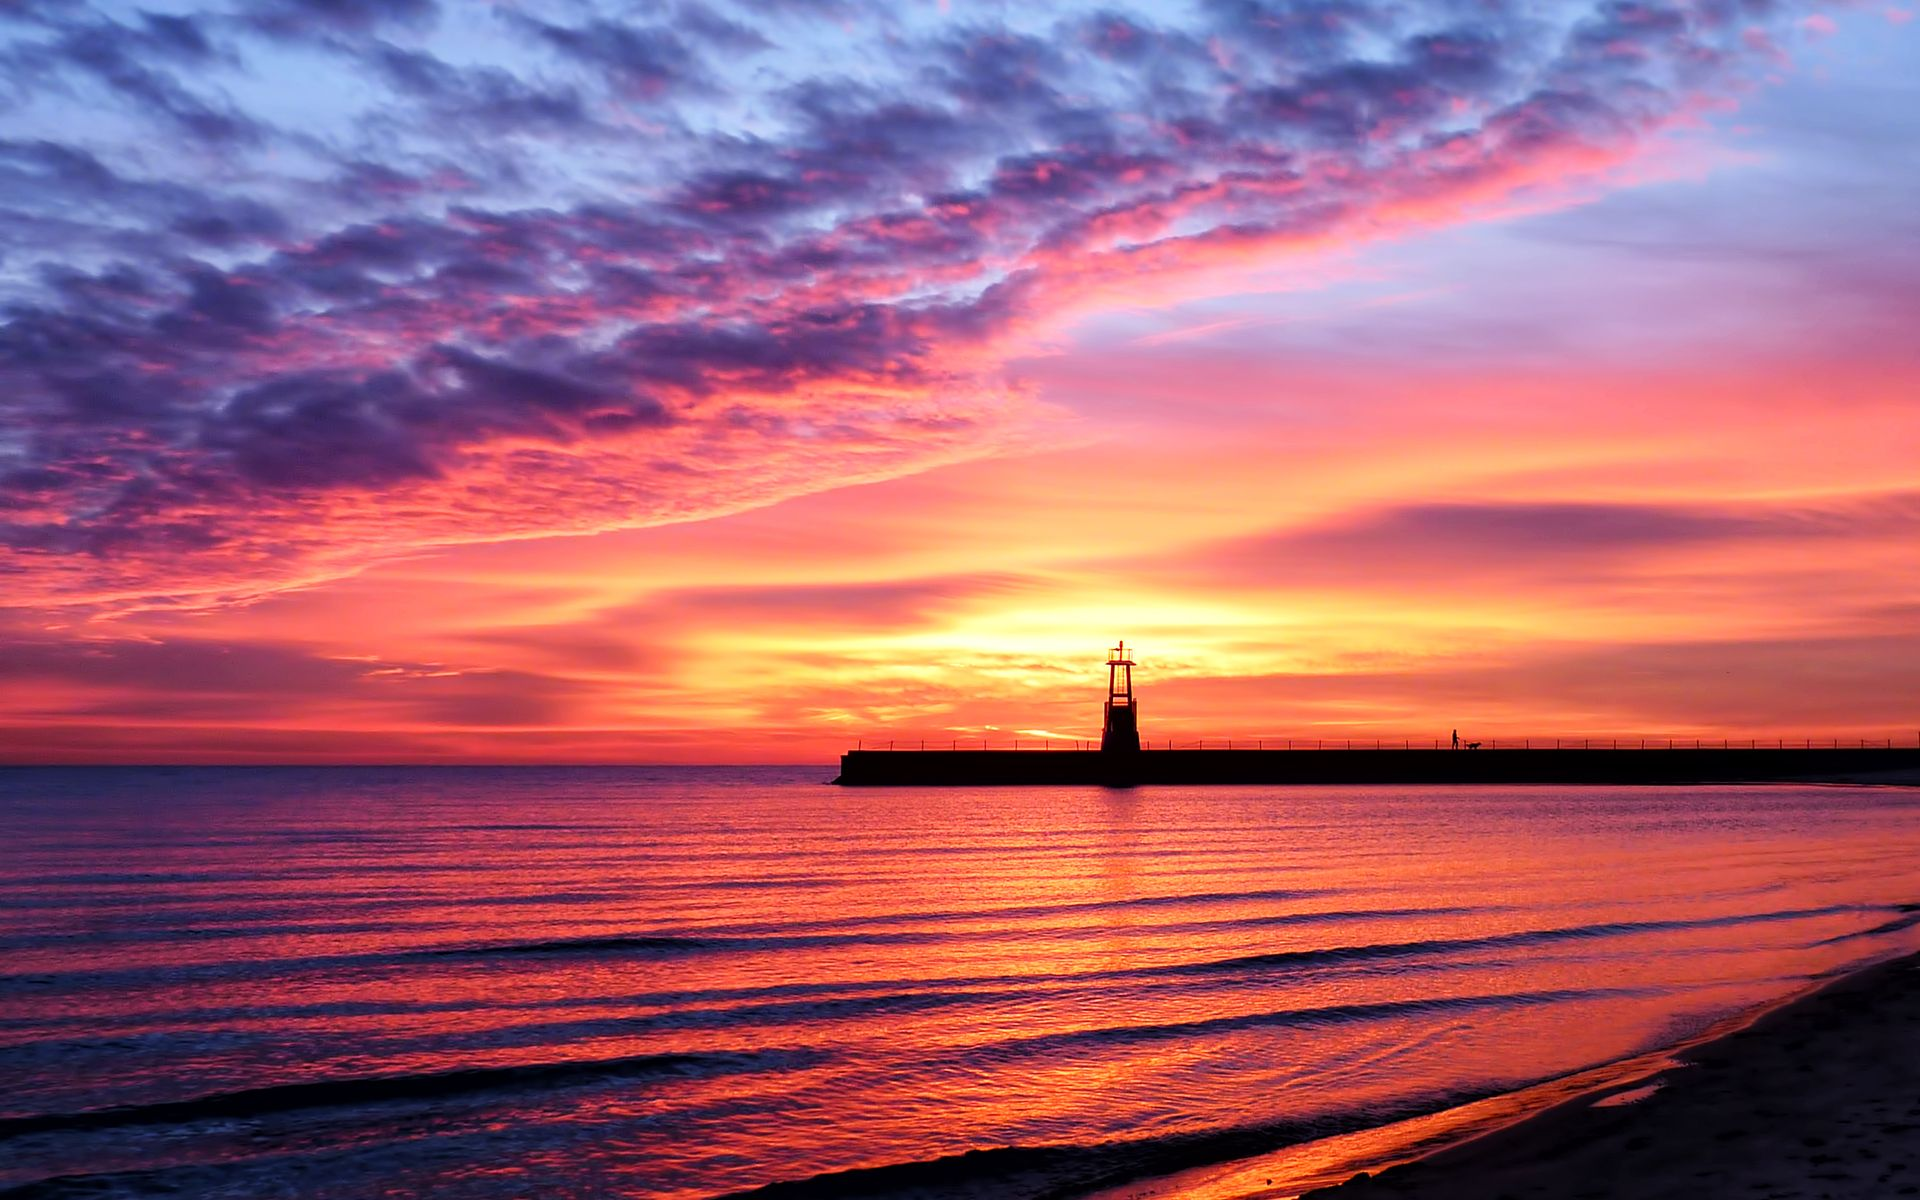 Landscape Sea Sunset Beauty Coast Beach Water Sky Lighthouse Sand Reflection Shine 1920x1200